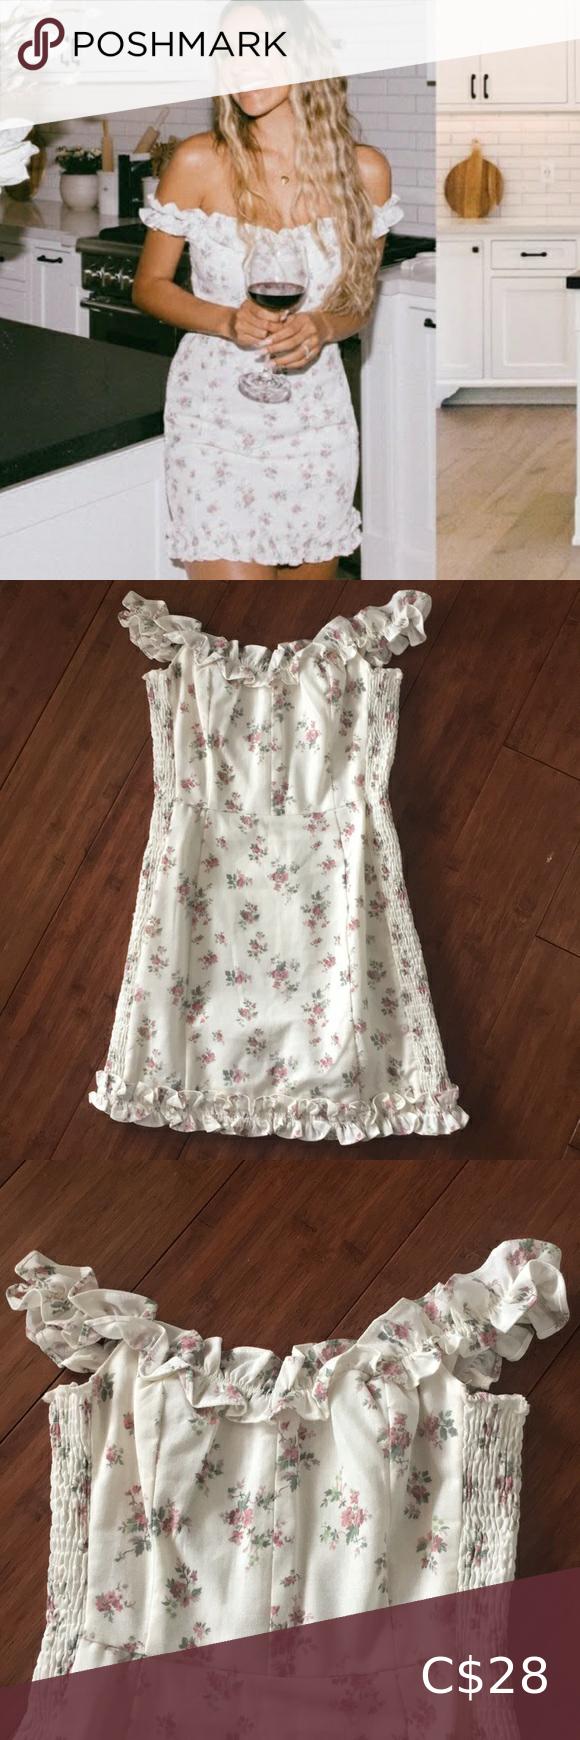 Windsor Store Mini Dress Vacation Dresses Mini Dress Dresses [ 1740 x 580 Pixel ]